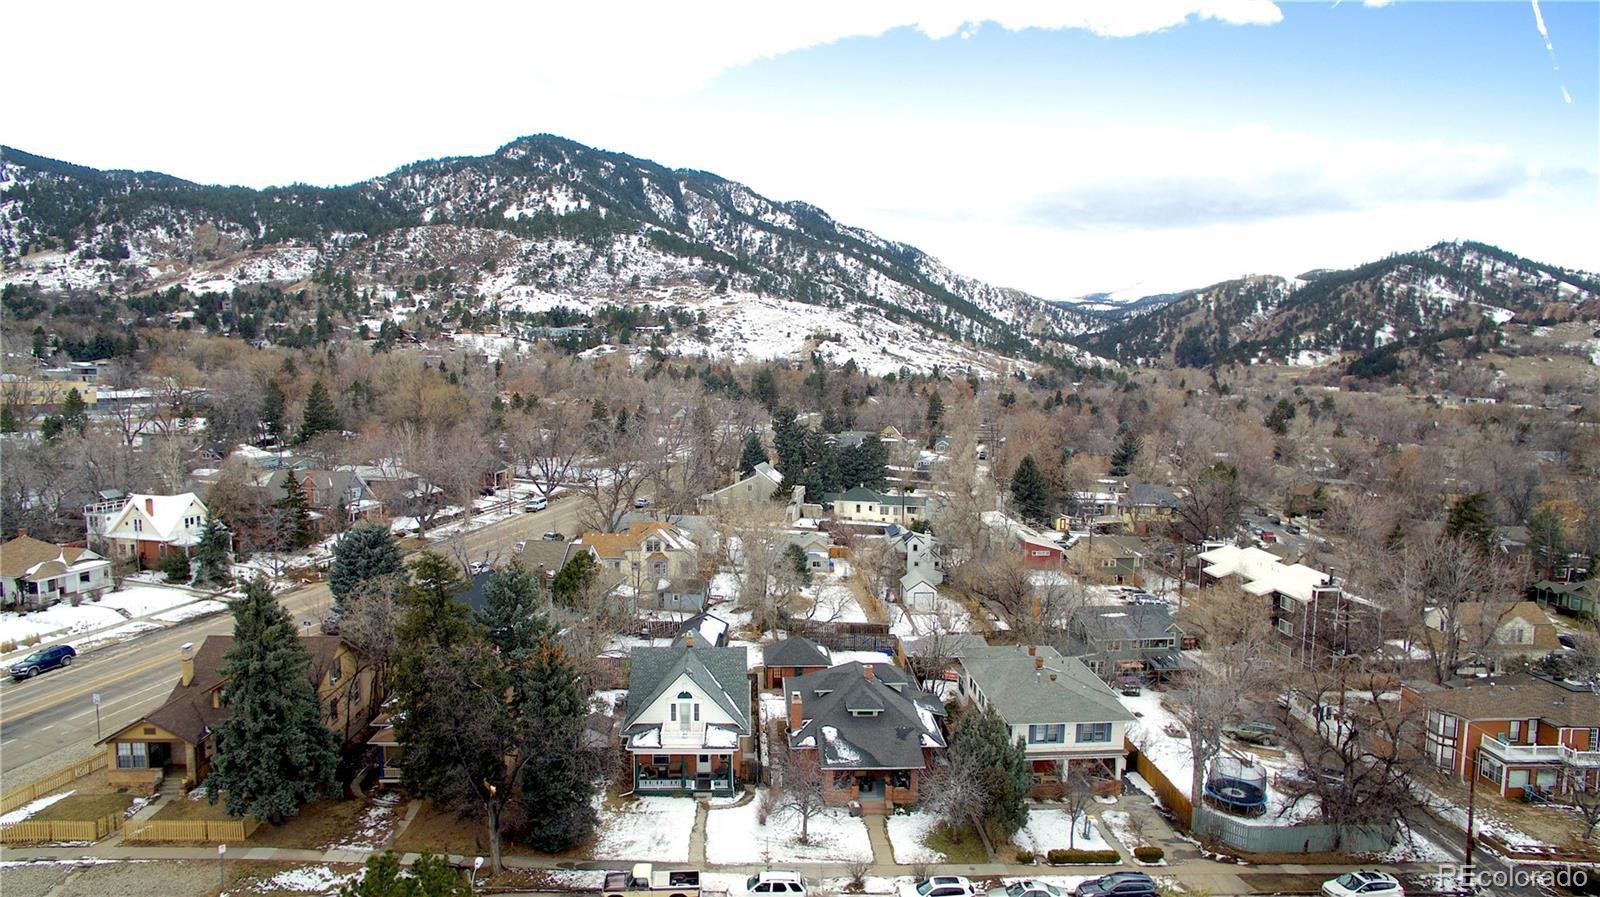 MLS# 3503411 - 4 - 1521 9th Street, Boulder, CO 80302